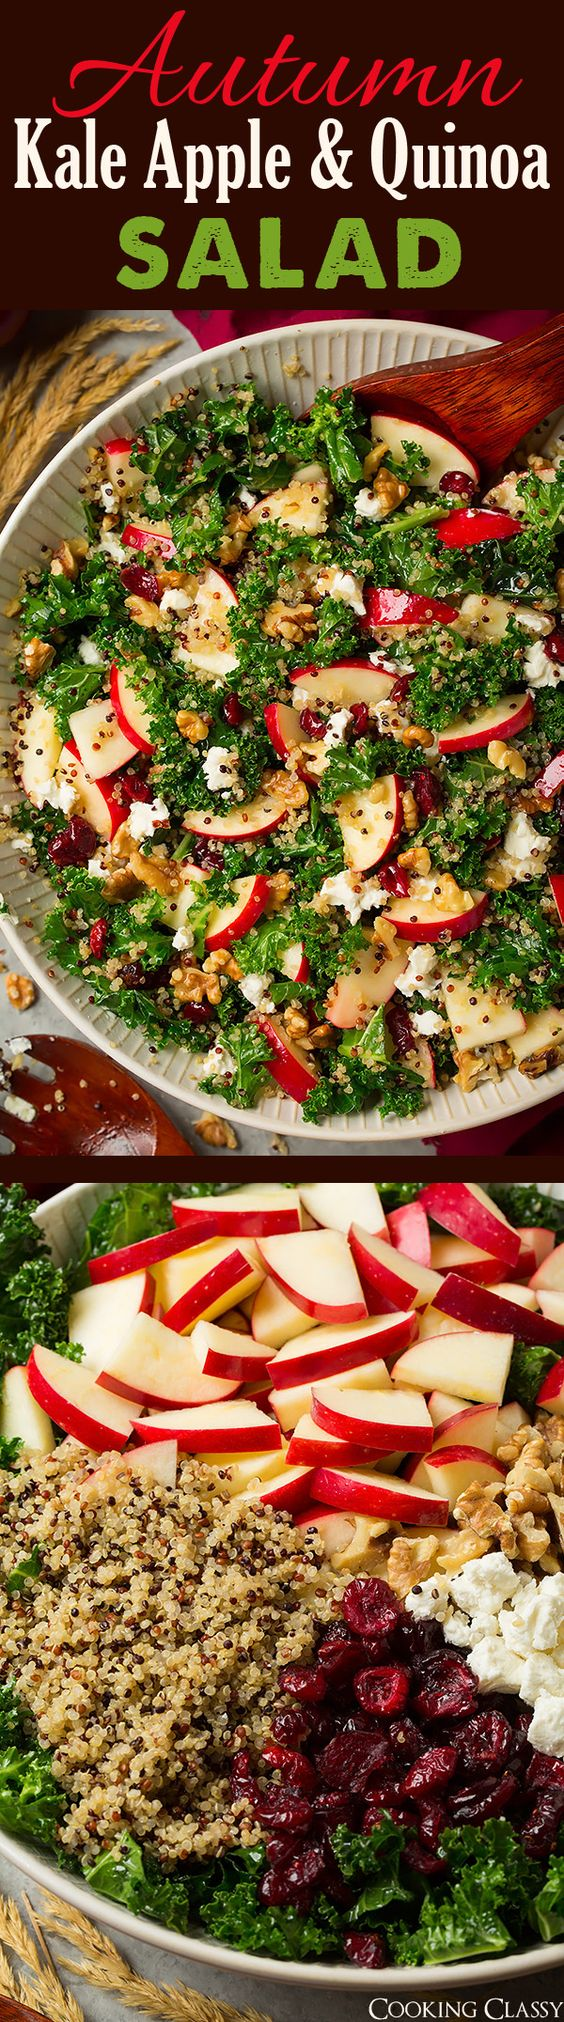 Autumn Kale Apple and Quinoa Salad.